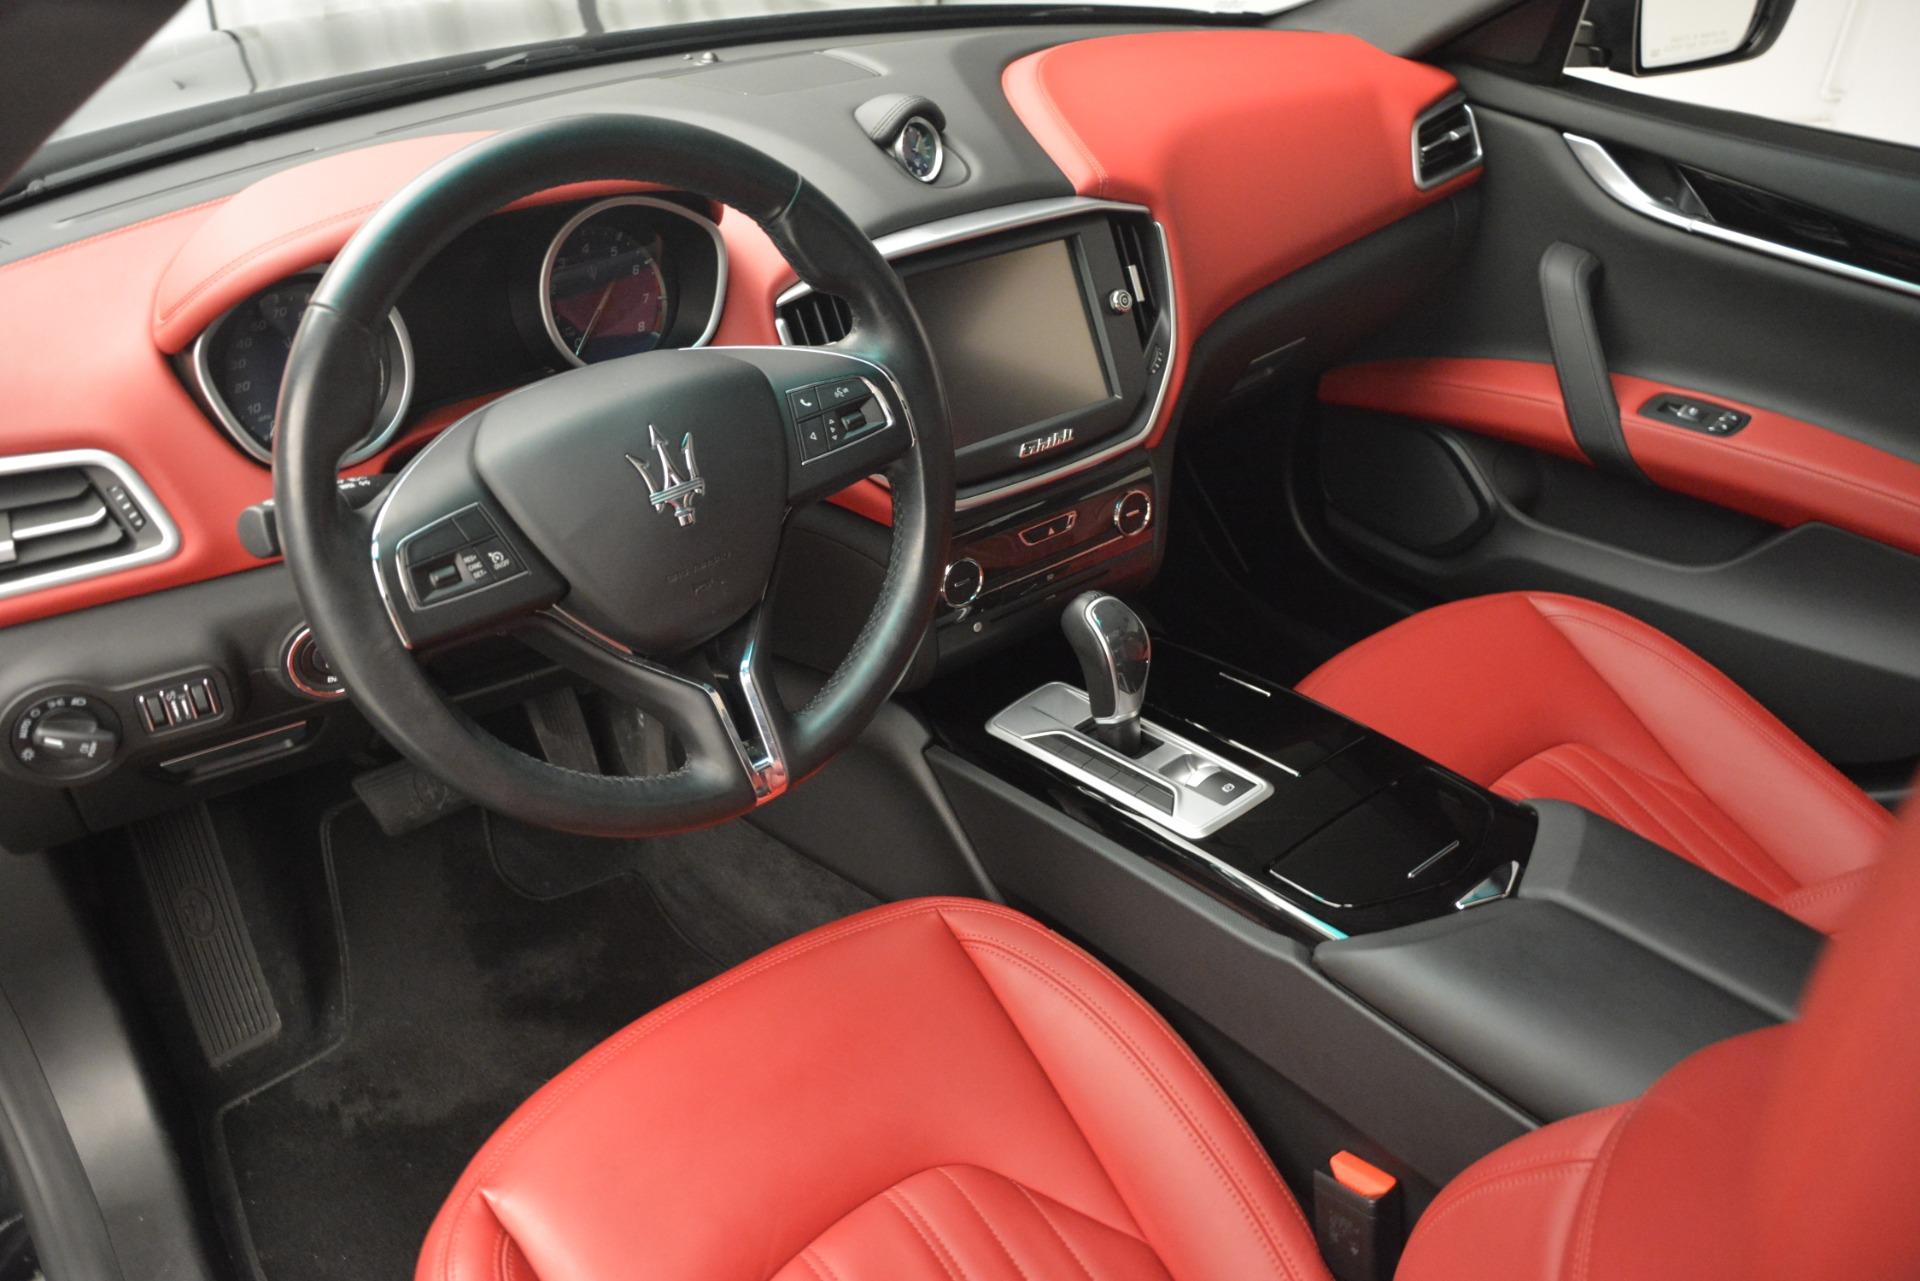 Used 2016 Maserati Ghibli S Q4 For Sale In Greenwich, CT 2945_p17